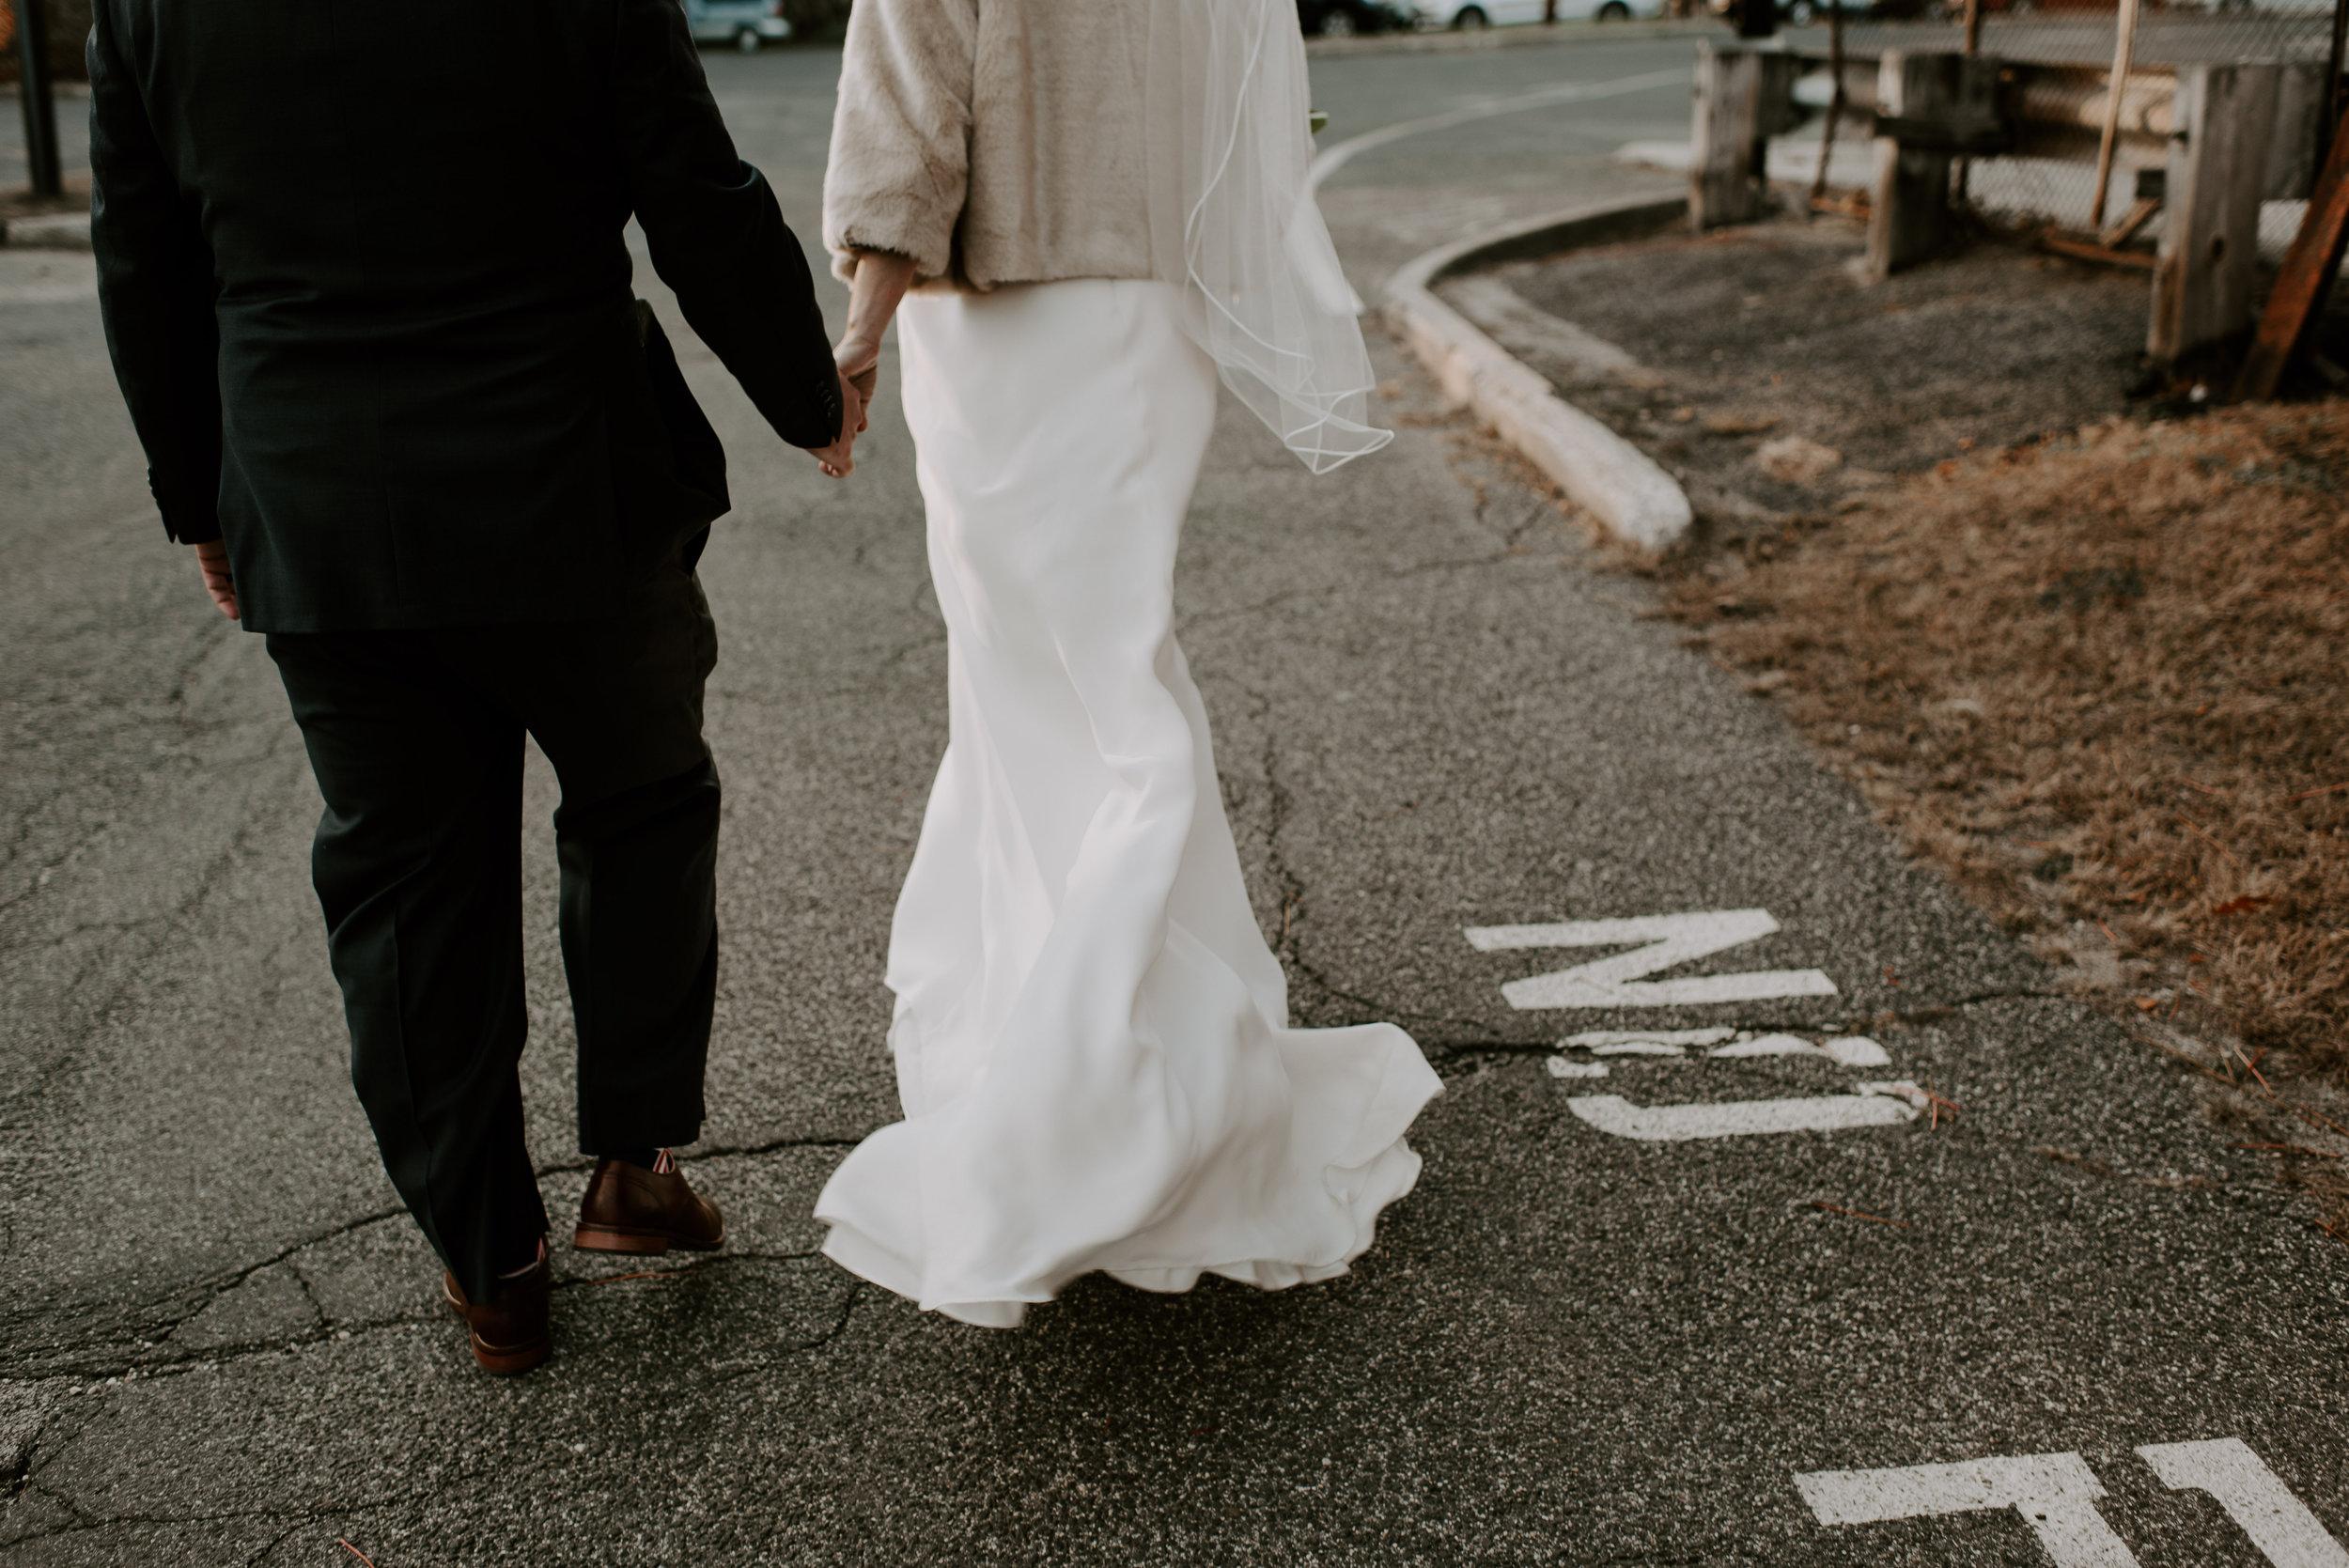 Moody Winter Industrial Berkshires Wedding   Boston Wedding Photographer   Madeline Rose Photography Co.